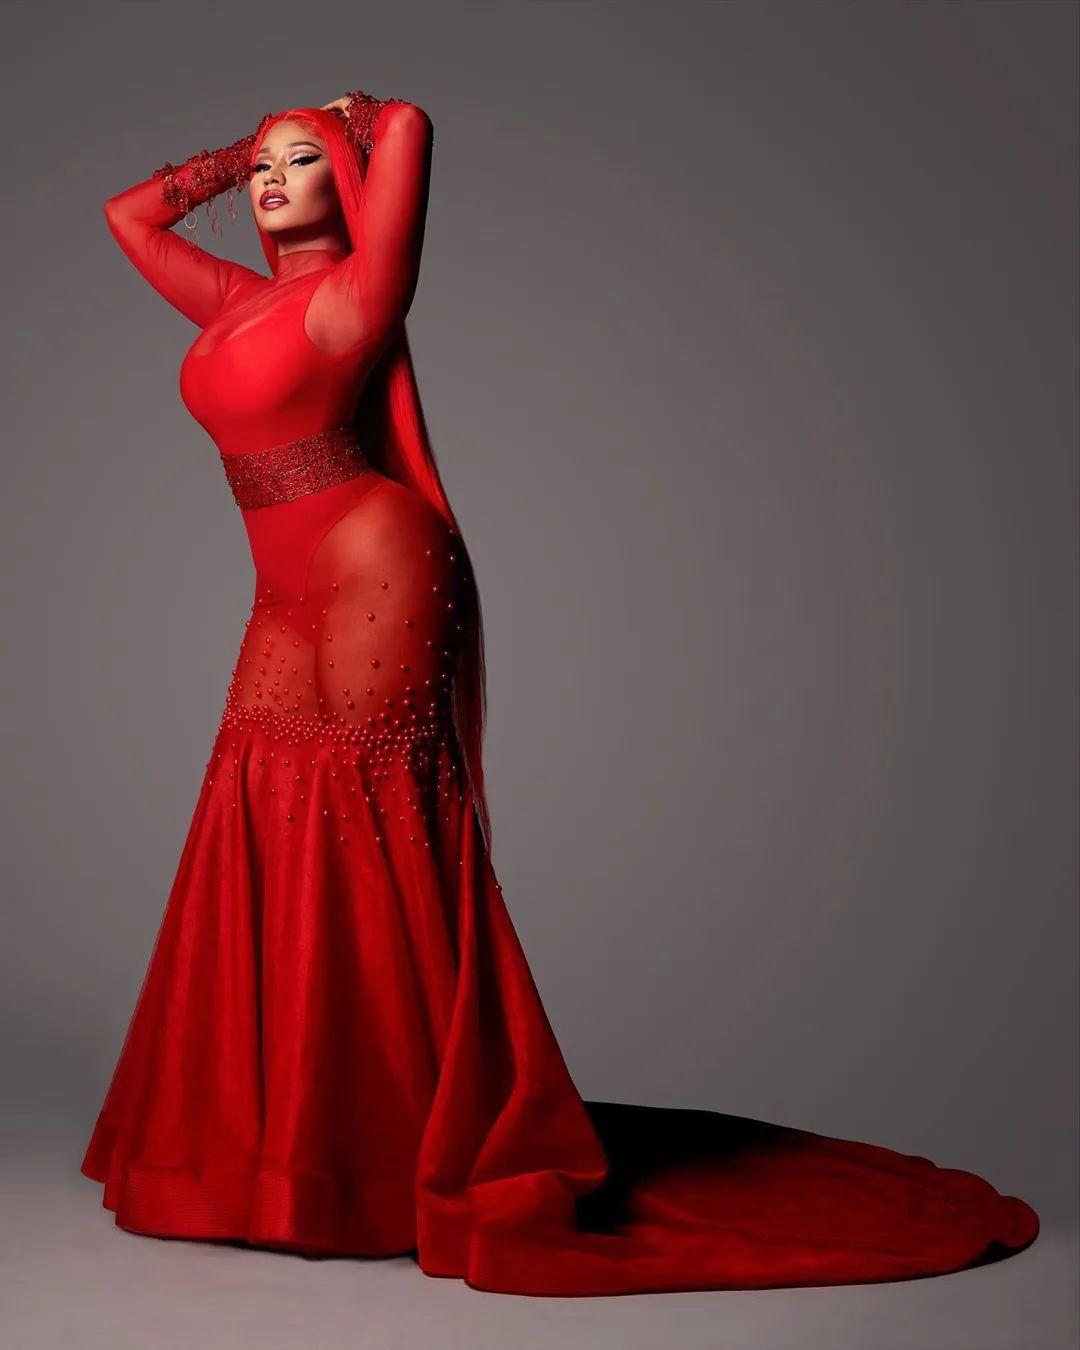 Nicki Minaj 成为首位资产过亿的饶舌女歌手!